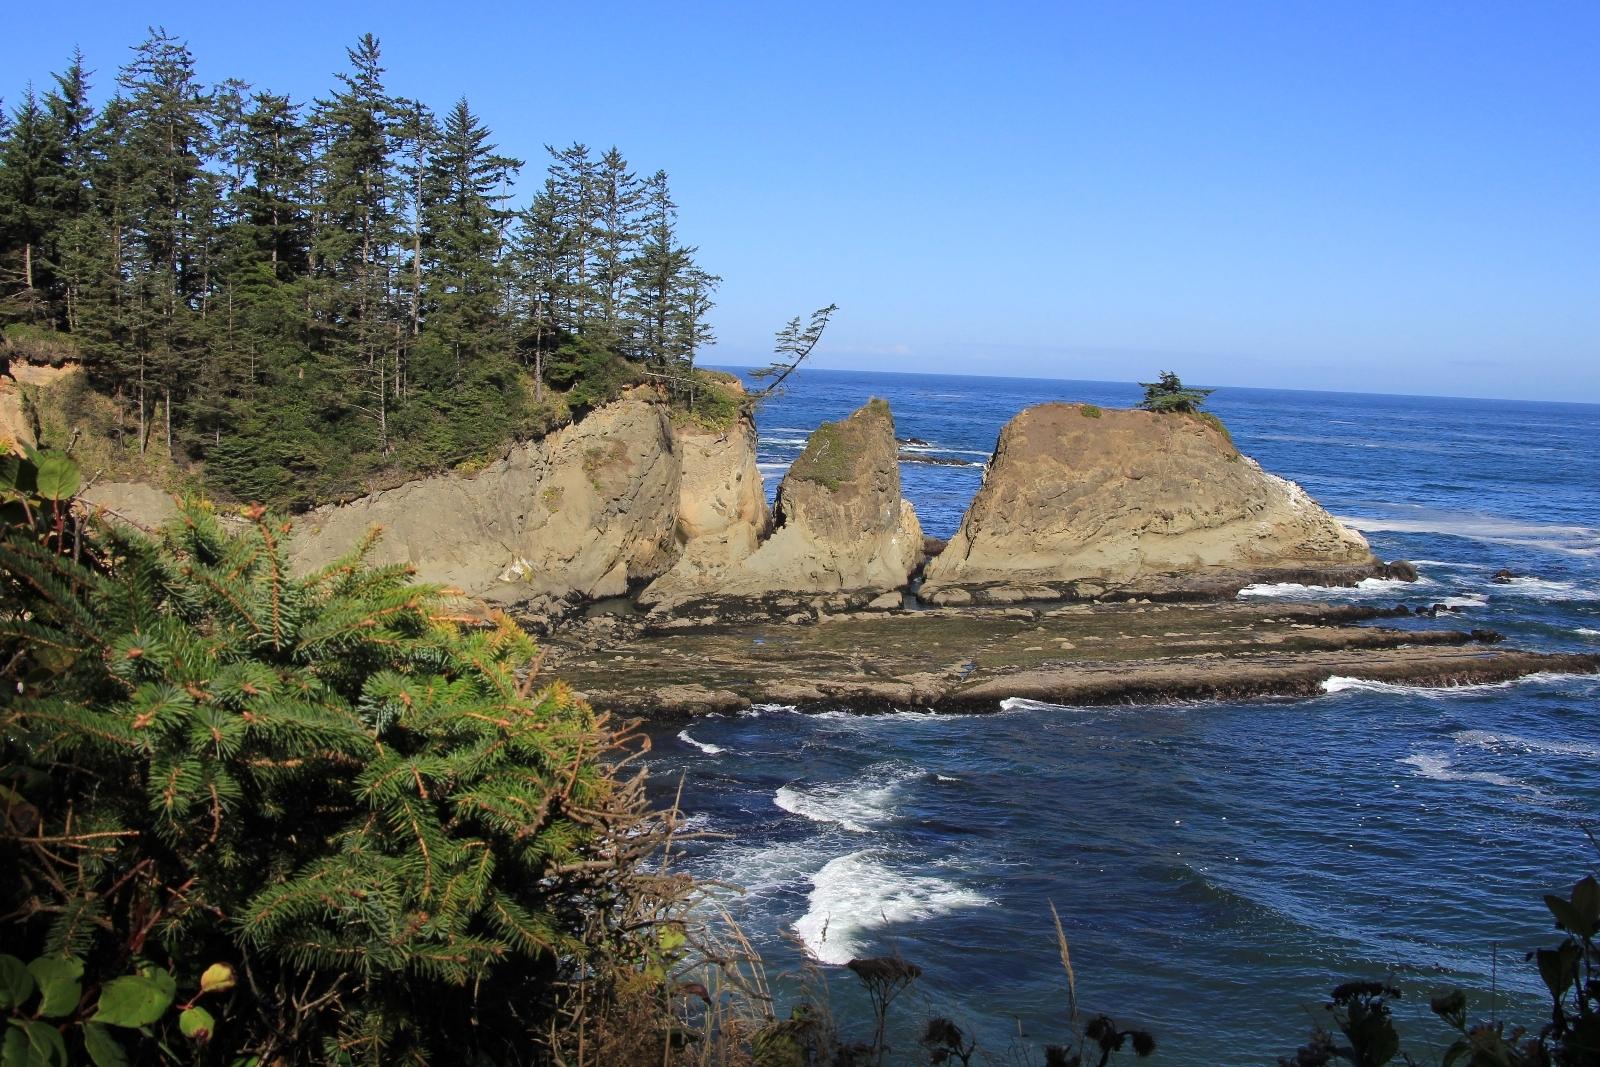 09-04-16-oregon-coast-shore-acres-39